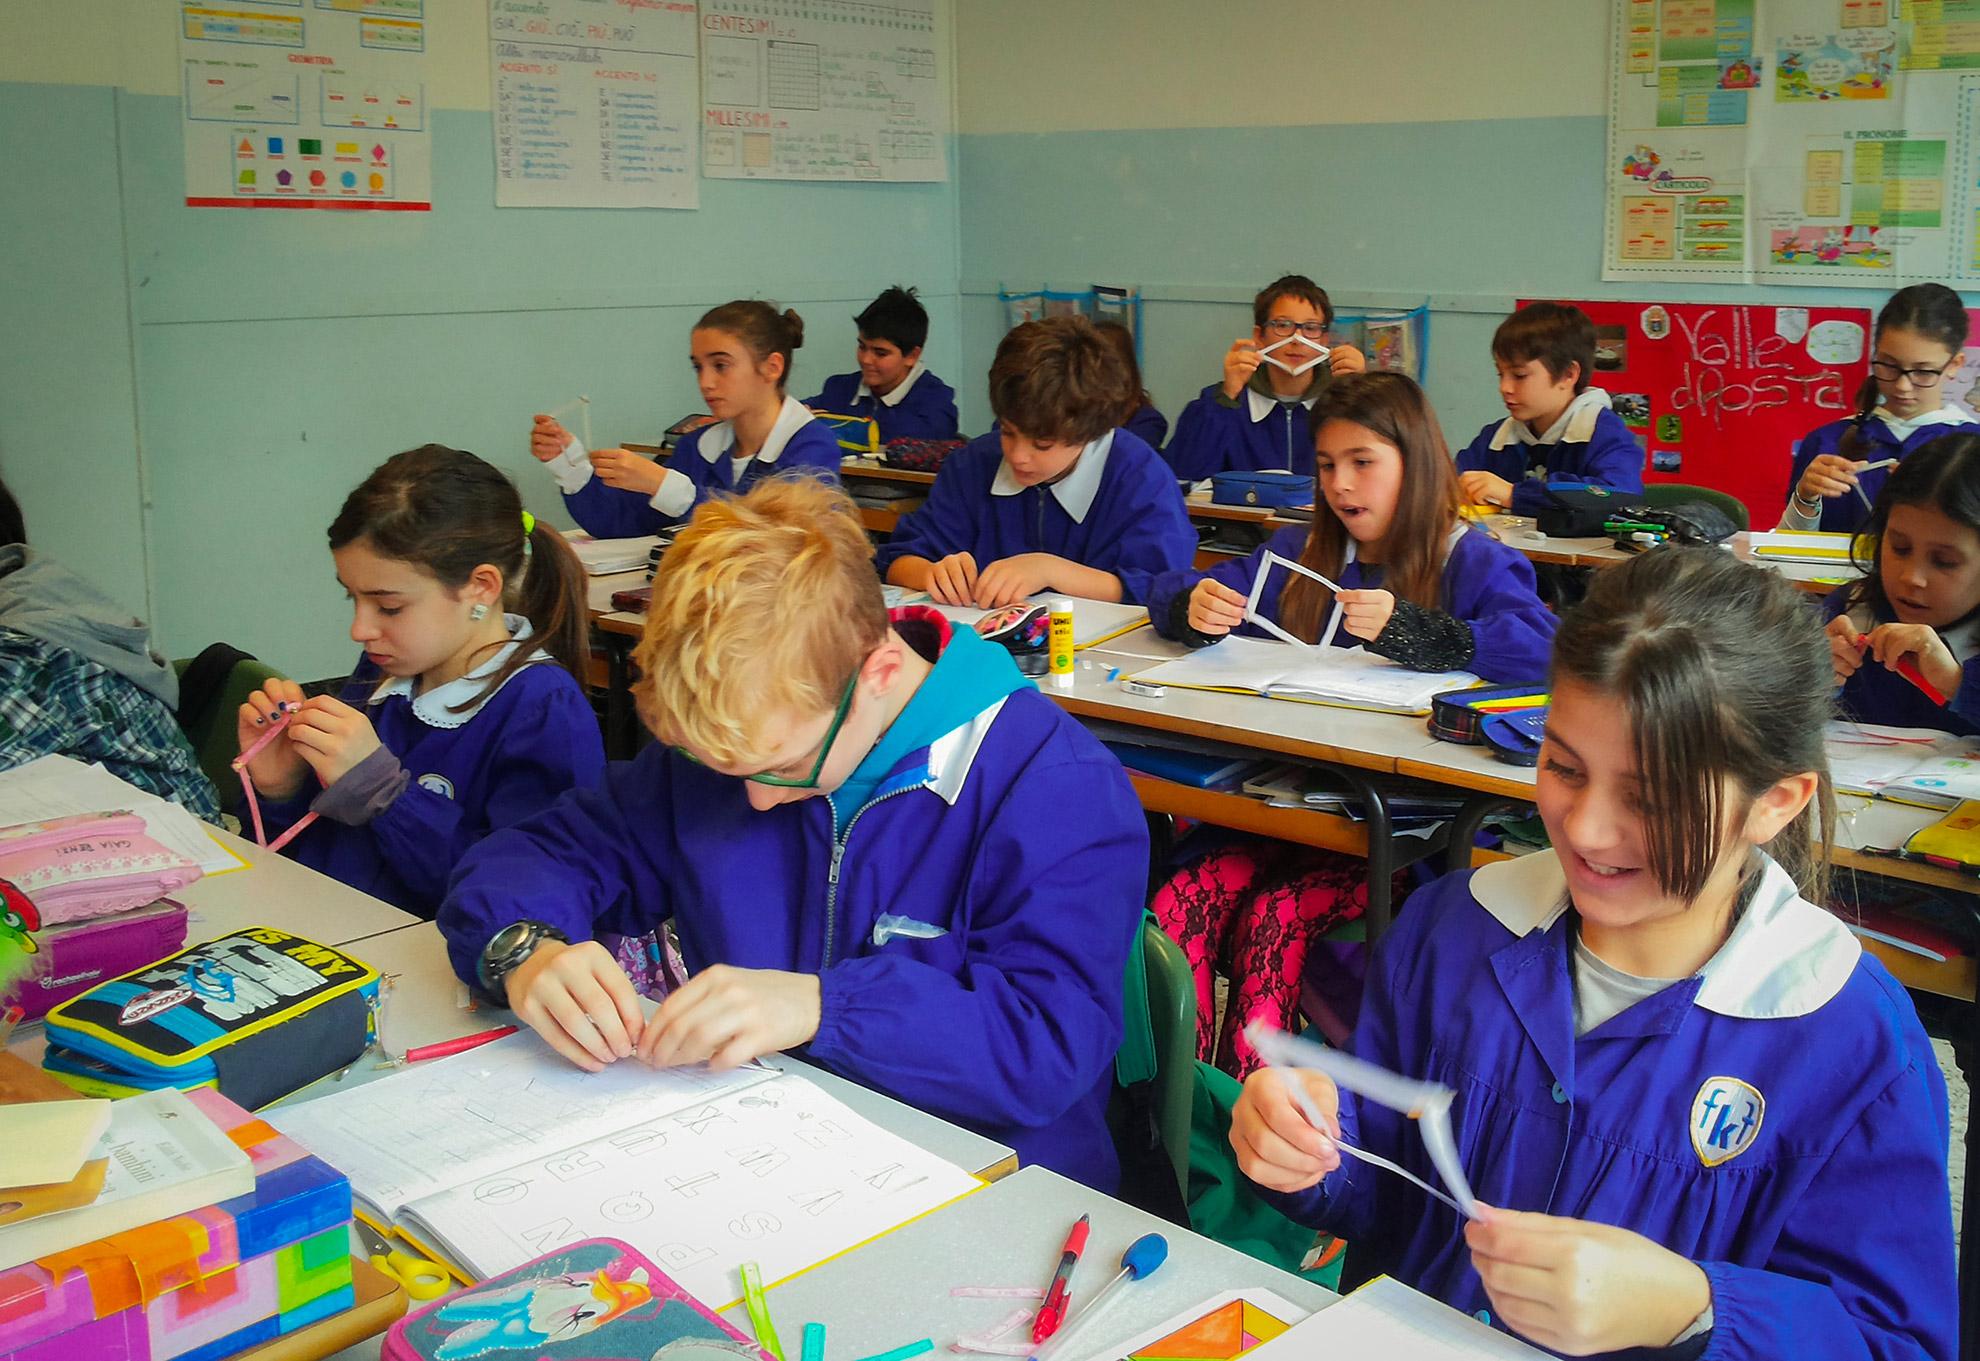 scuola margherita zoebeli rimini - photo#38